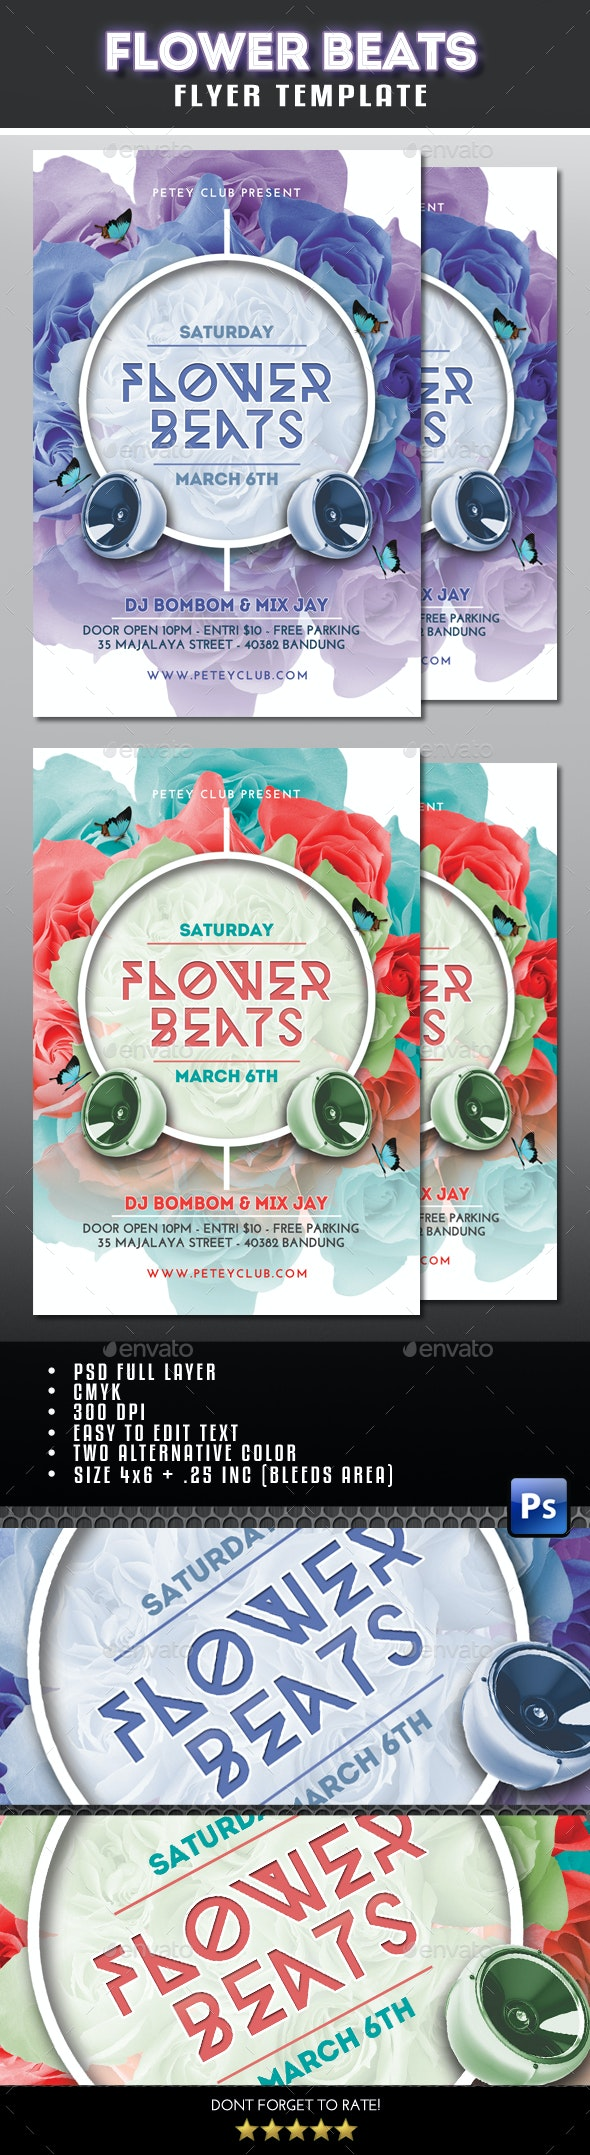 Flower Beats Flyer - Clubs & Parties Events